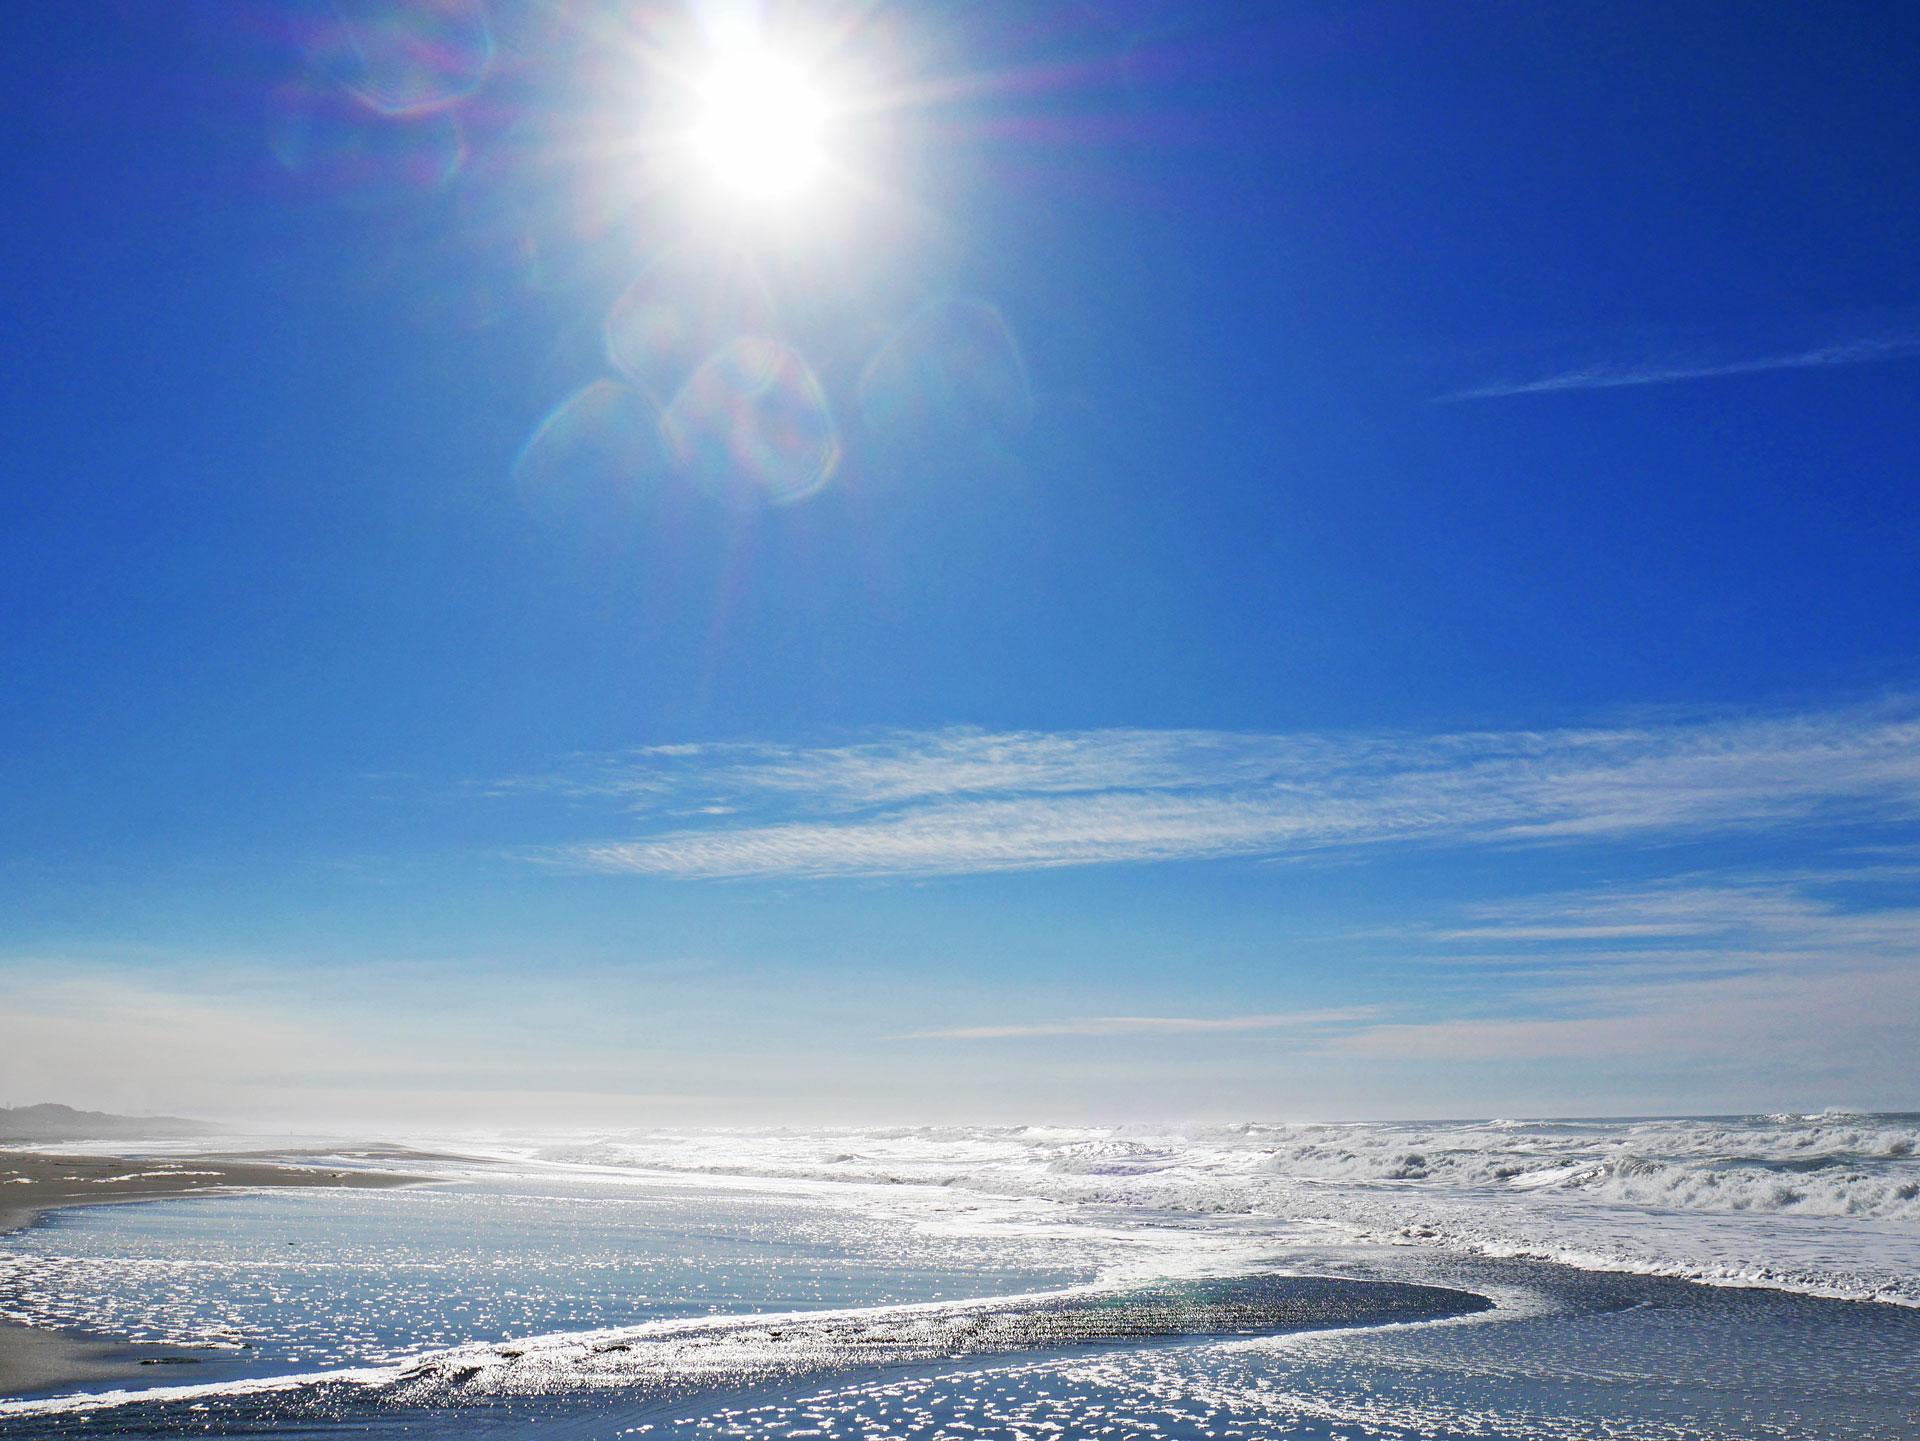 Sun shining over ocean in Samoa, Humboldt County, CA